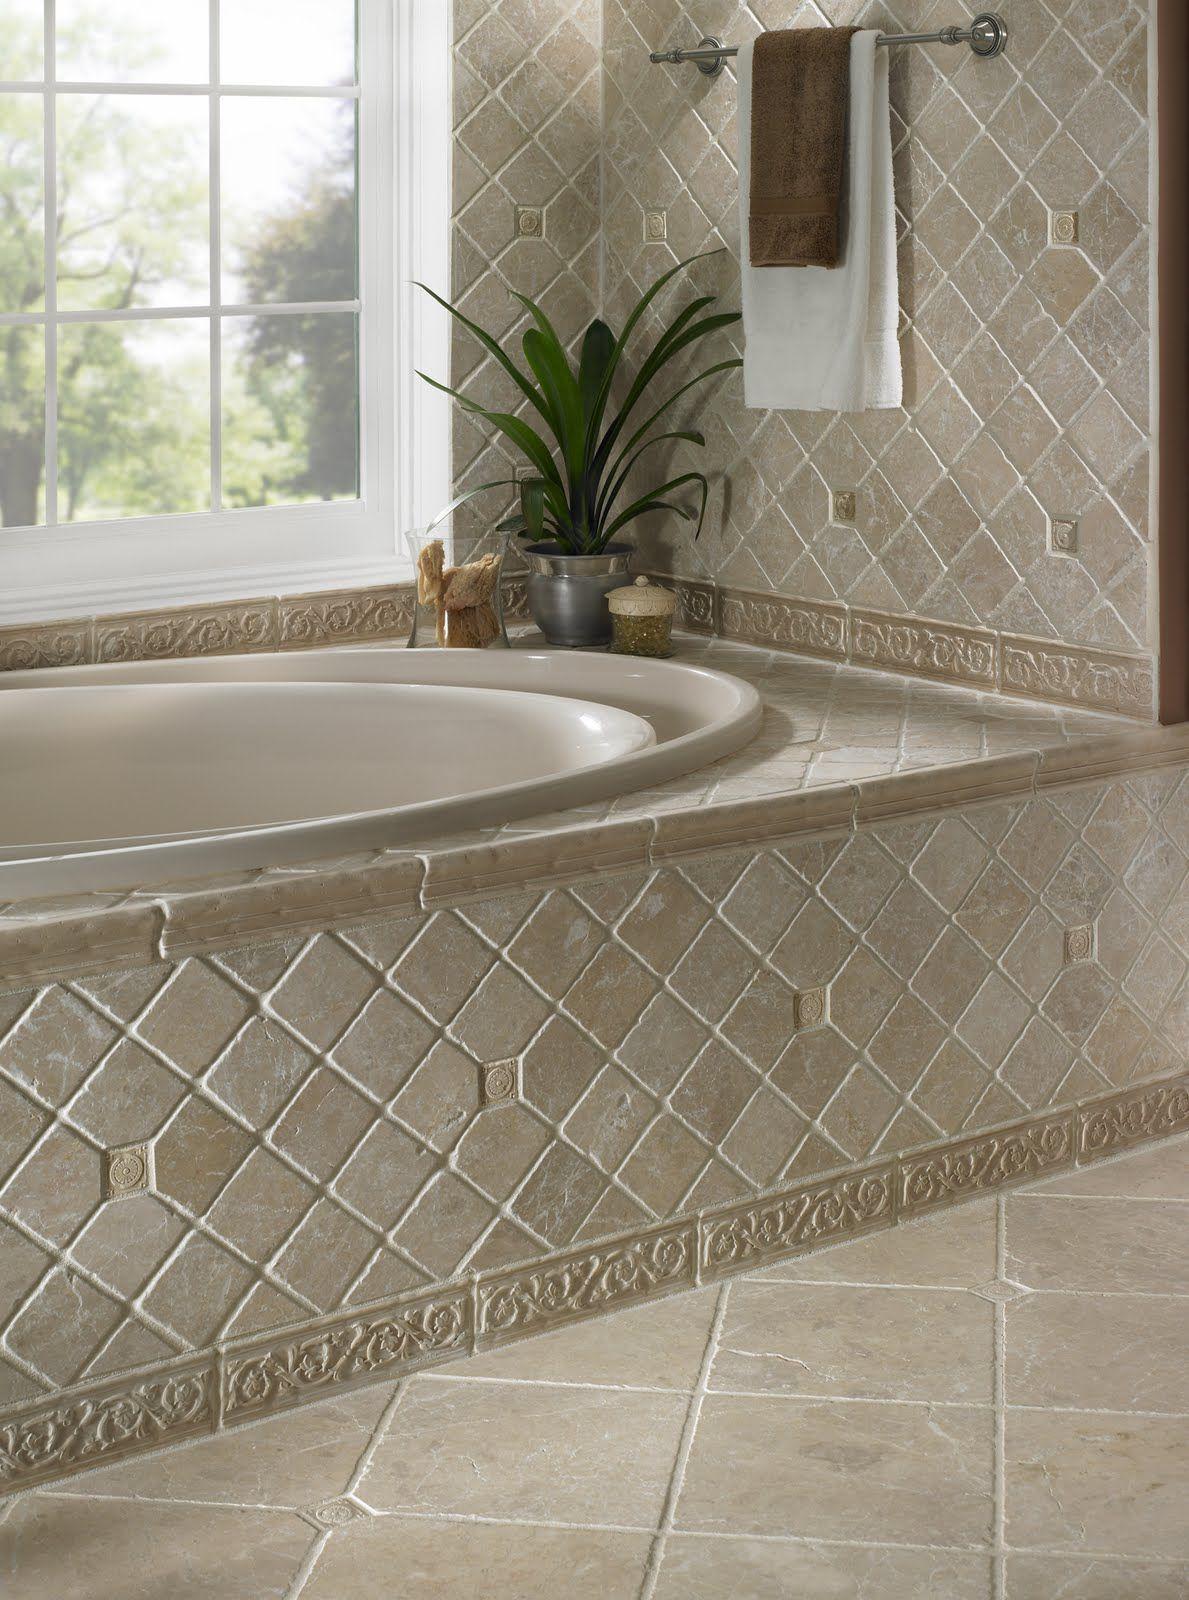 Backsplash picture ideas lifetime sealer on tumbled for Tumbled marble bathroom designs